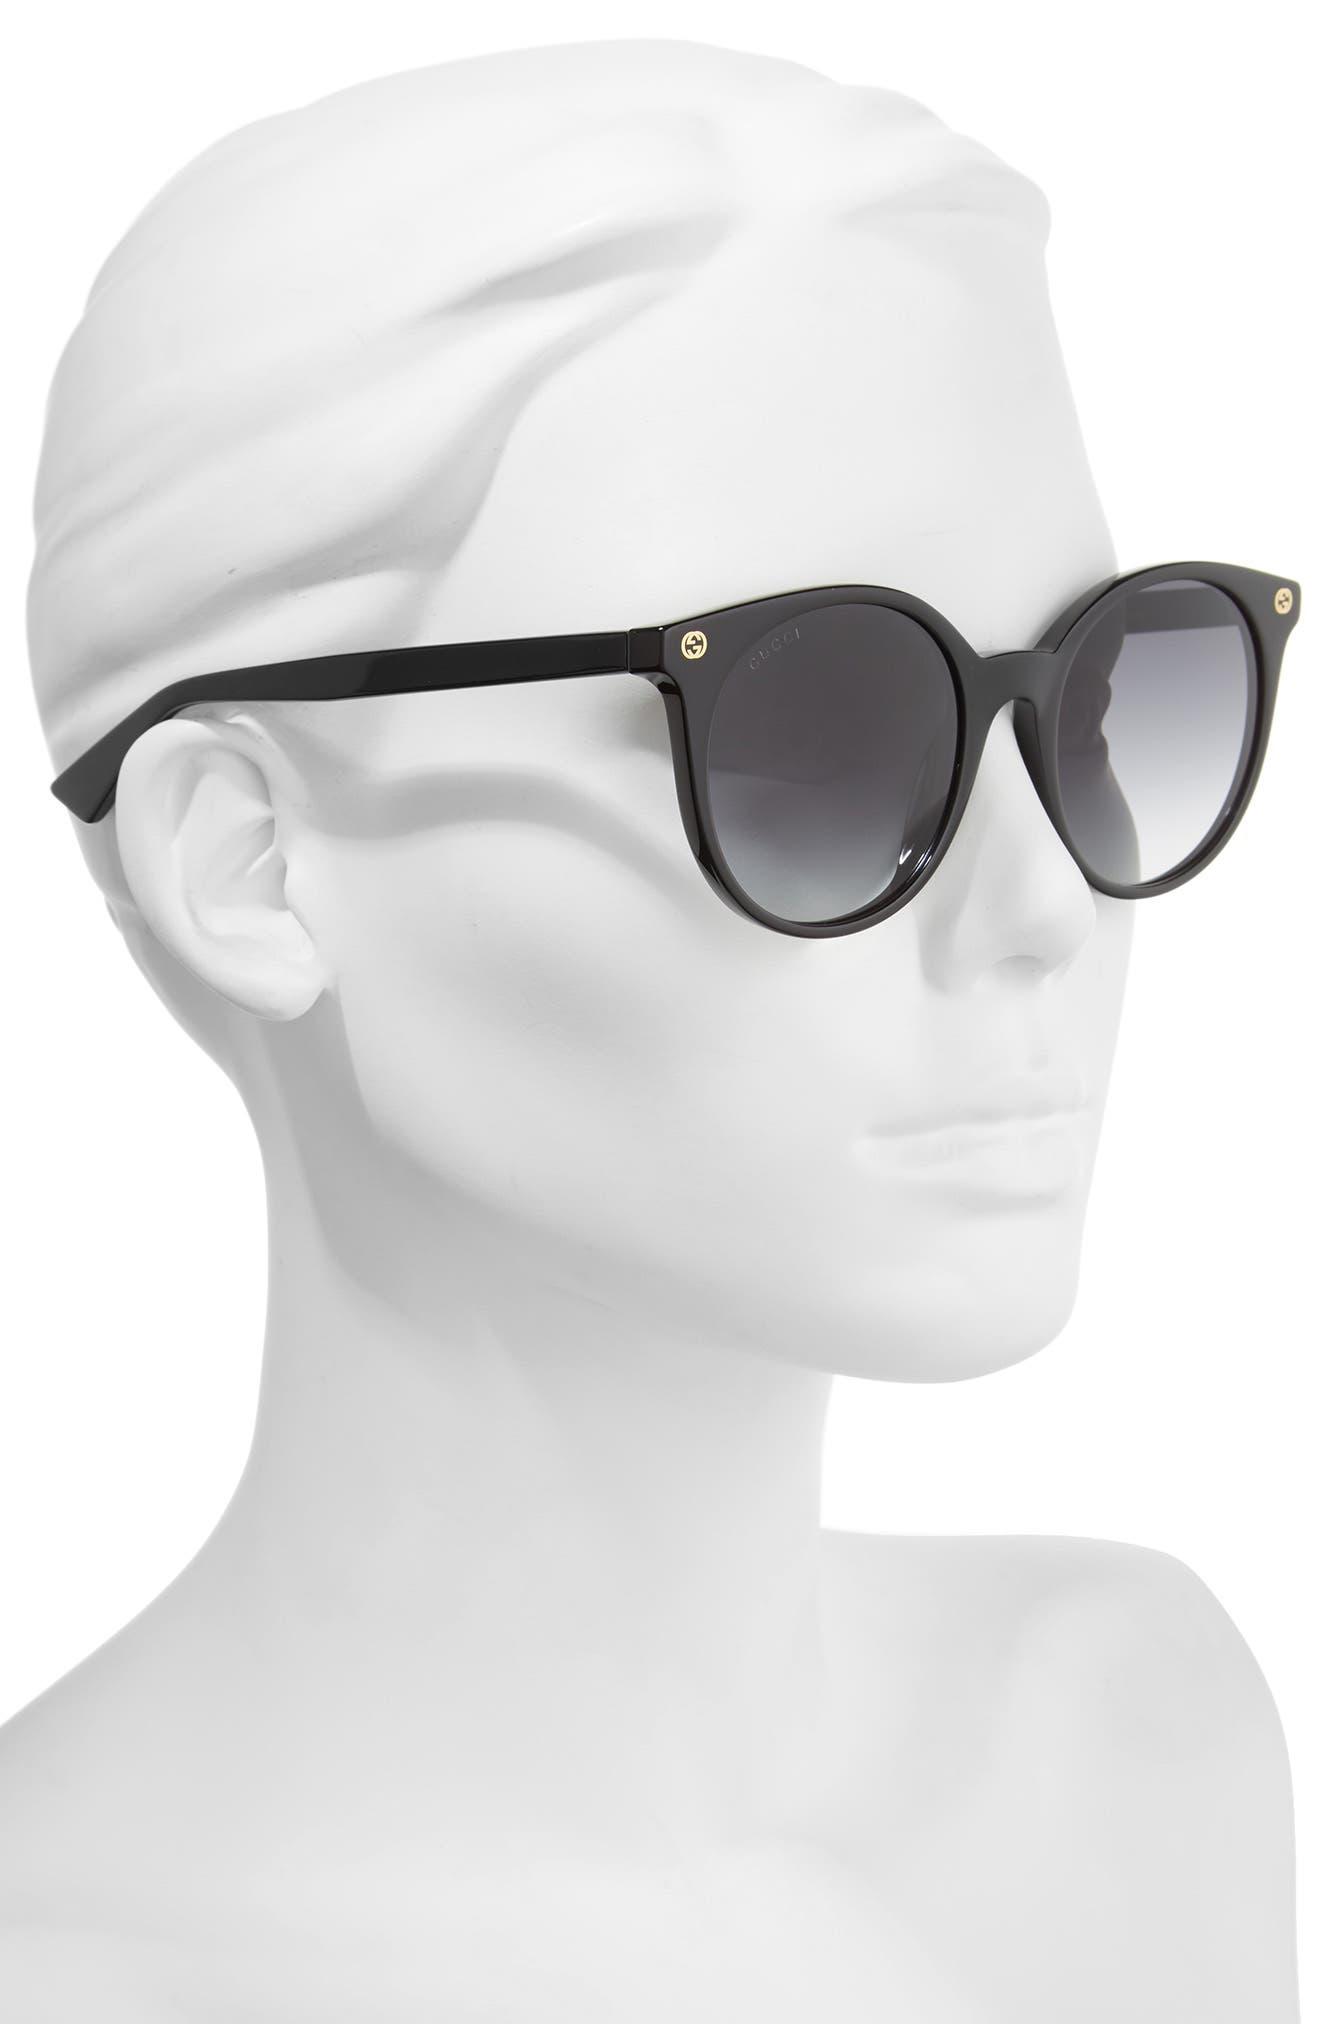 52mm Round Sunglasses,                             Alternate thumbnail 5, color,